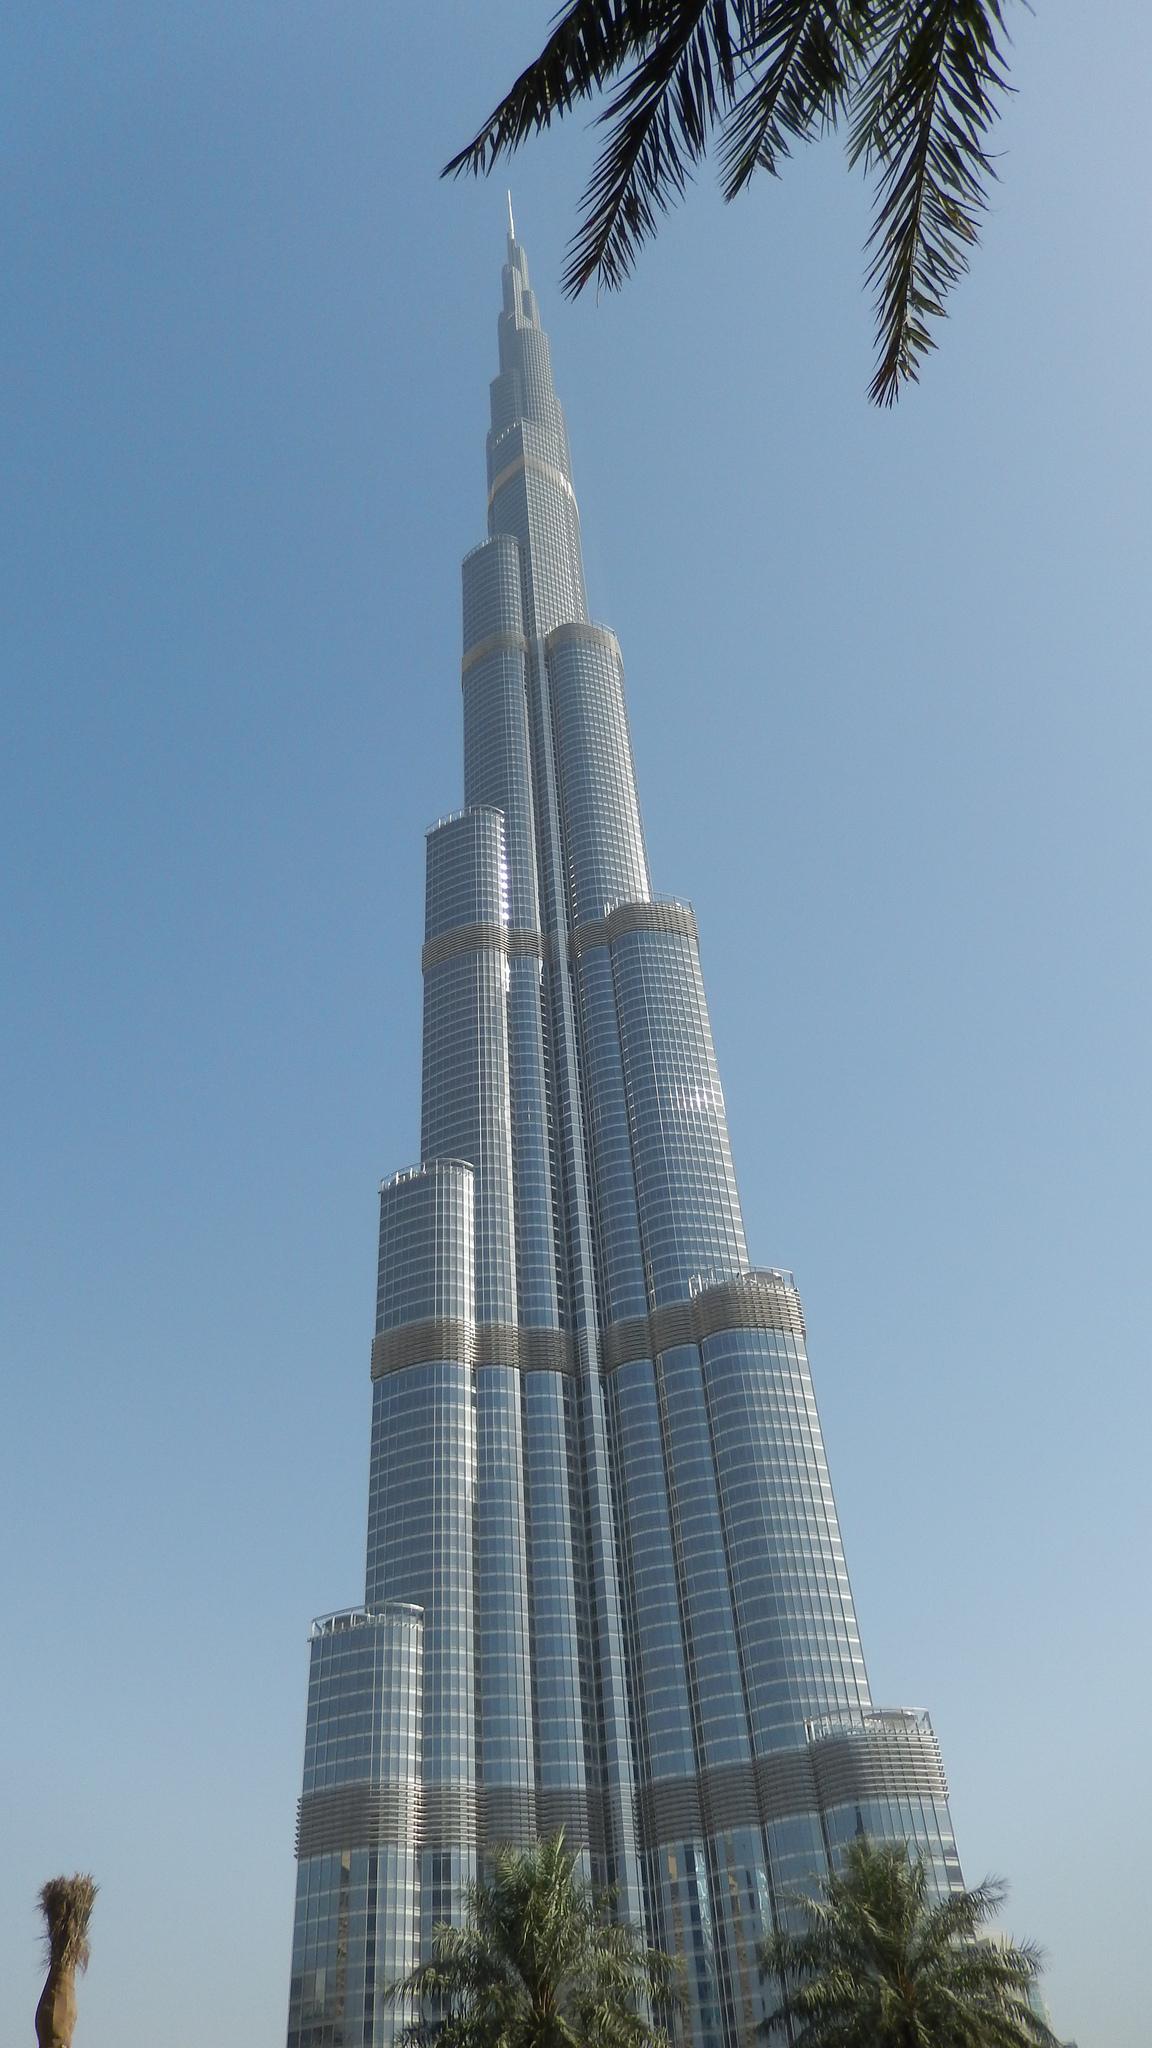 leil.de/di/pics/Burj_Khalifa_2013.jpg